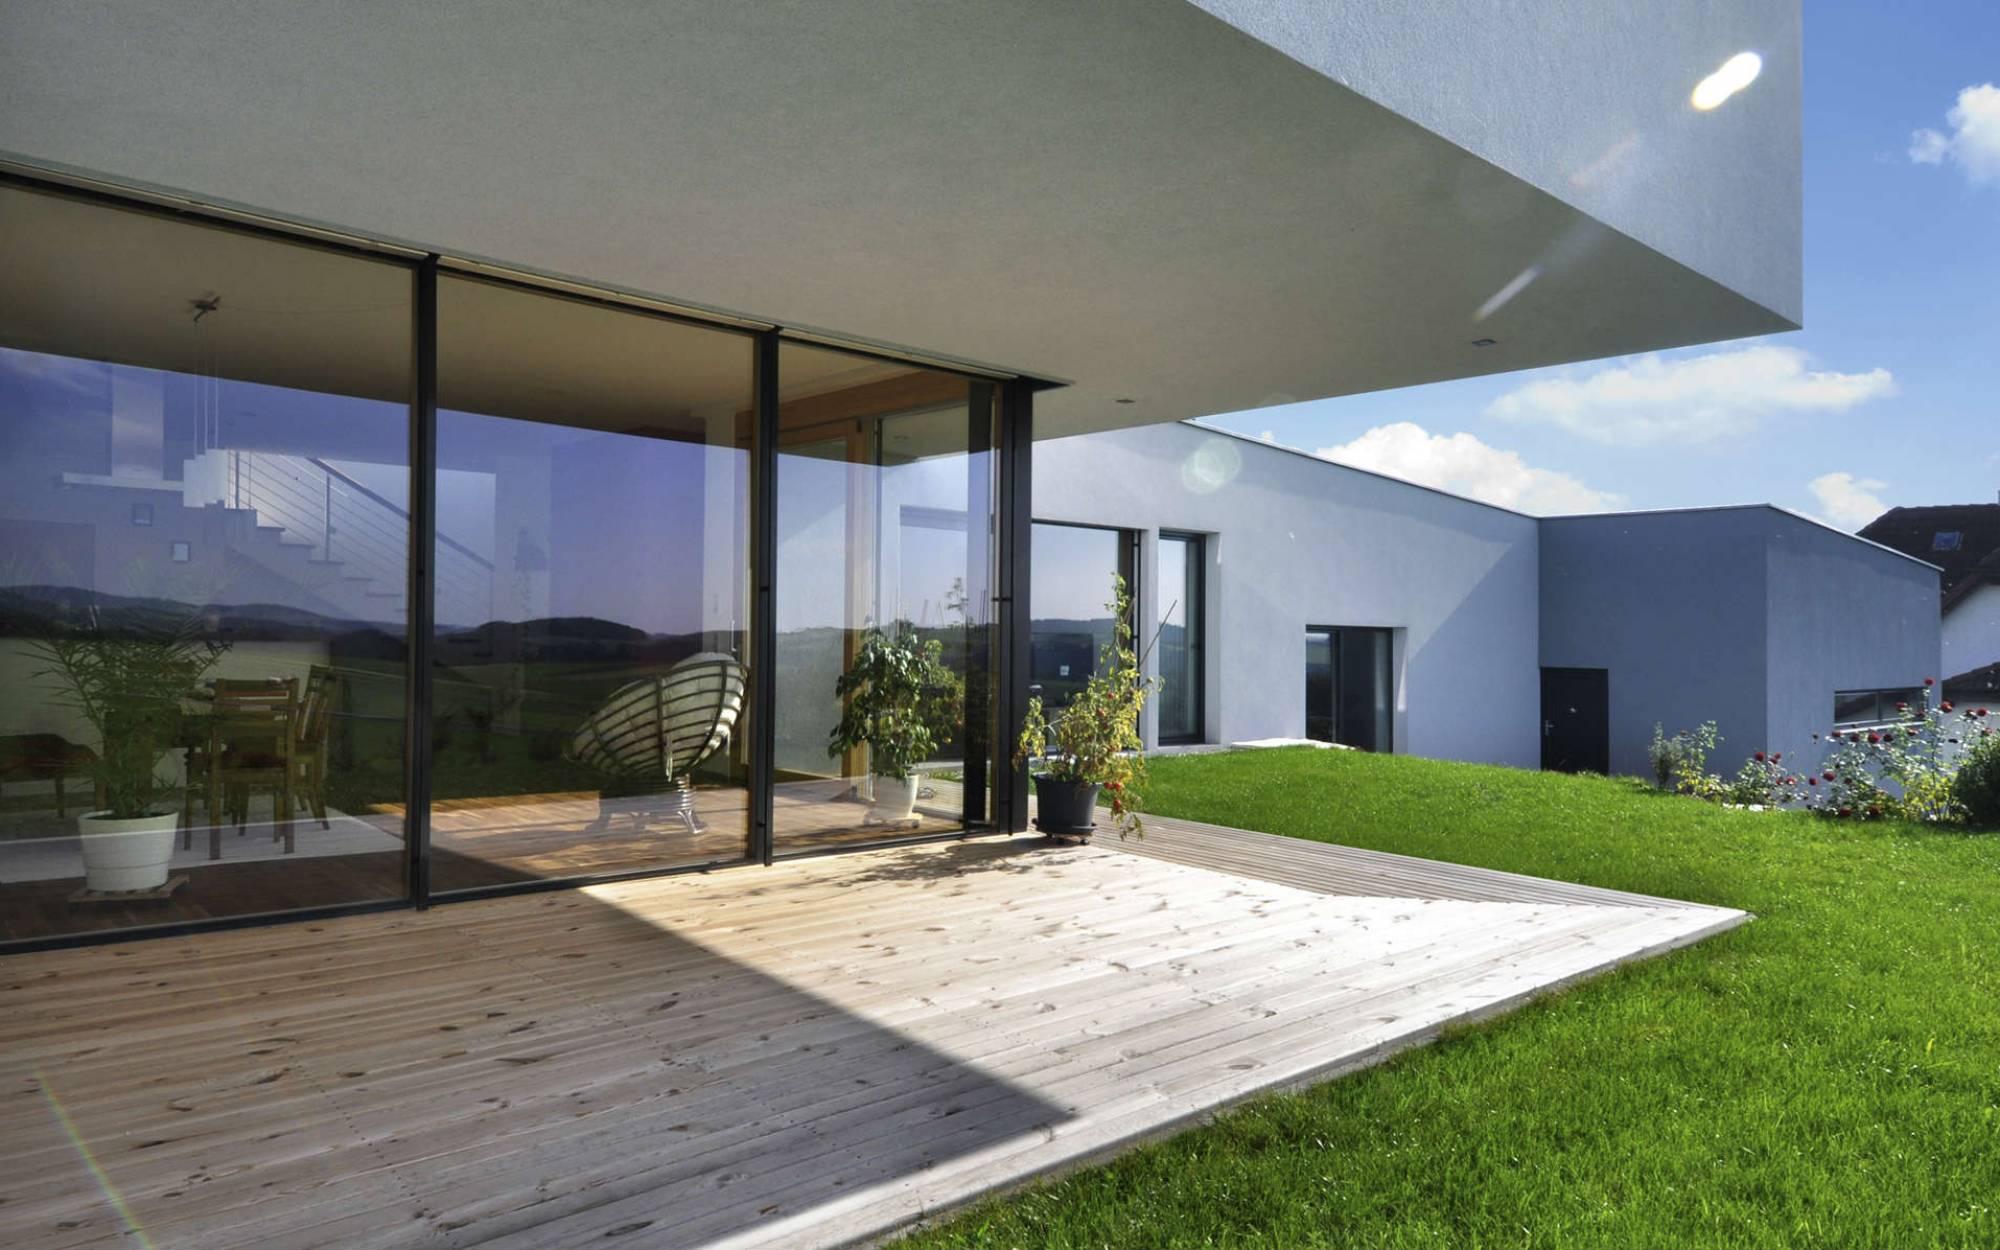 The benefits of Triple glazing